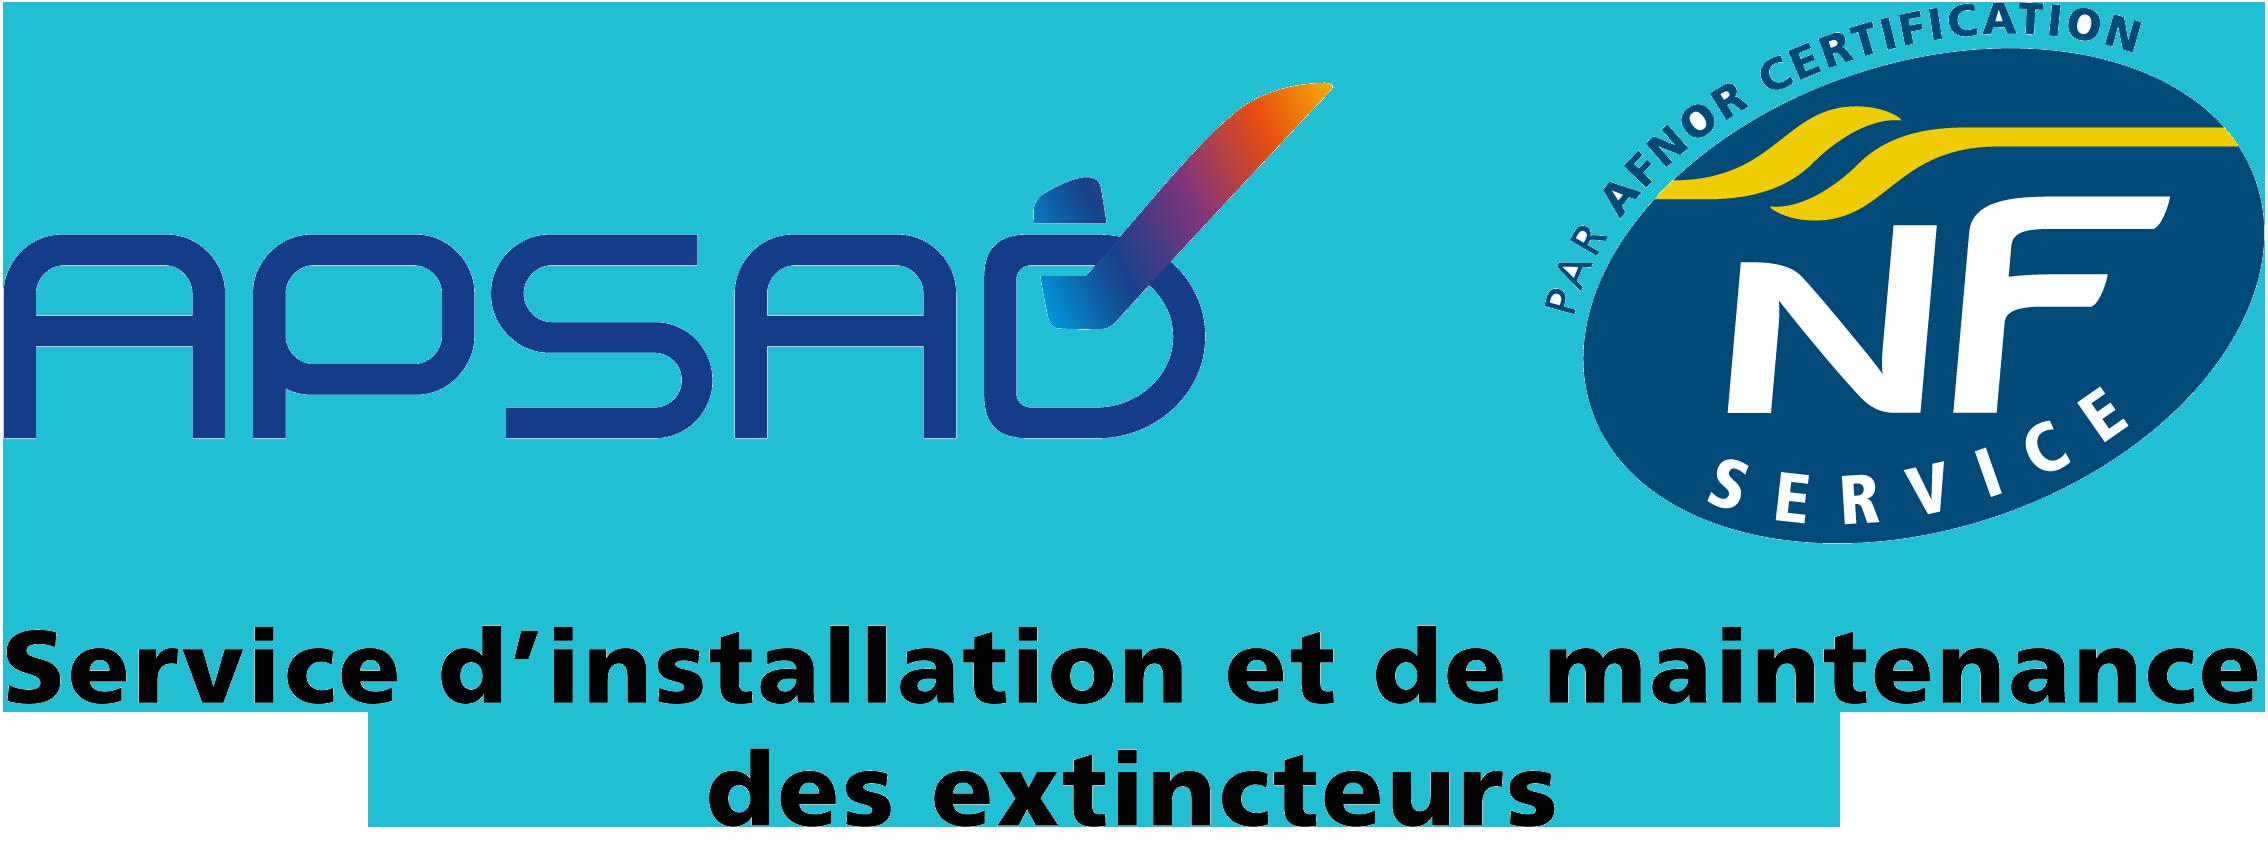 Logo certif - Extincteurs